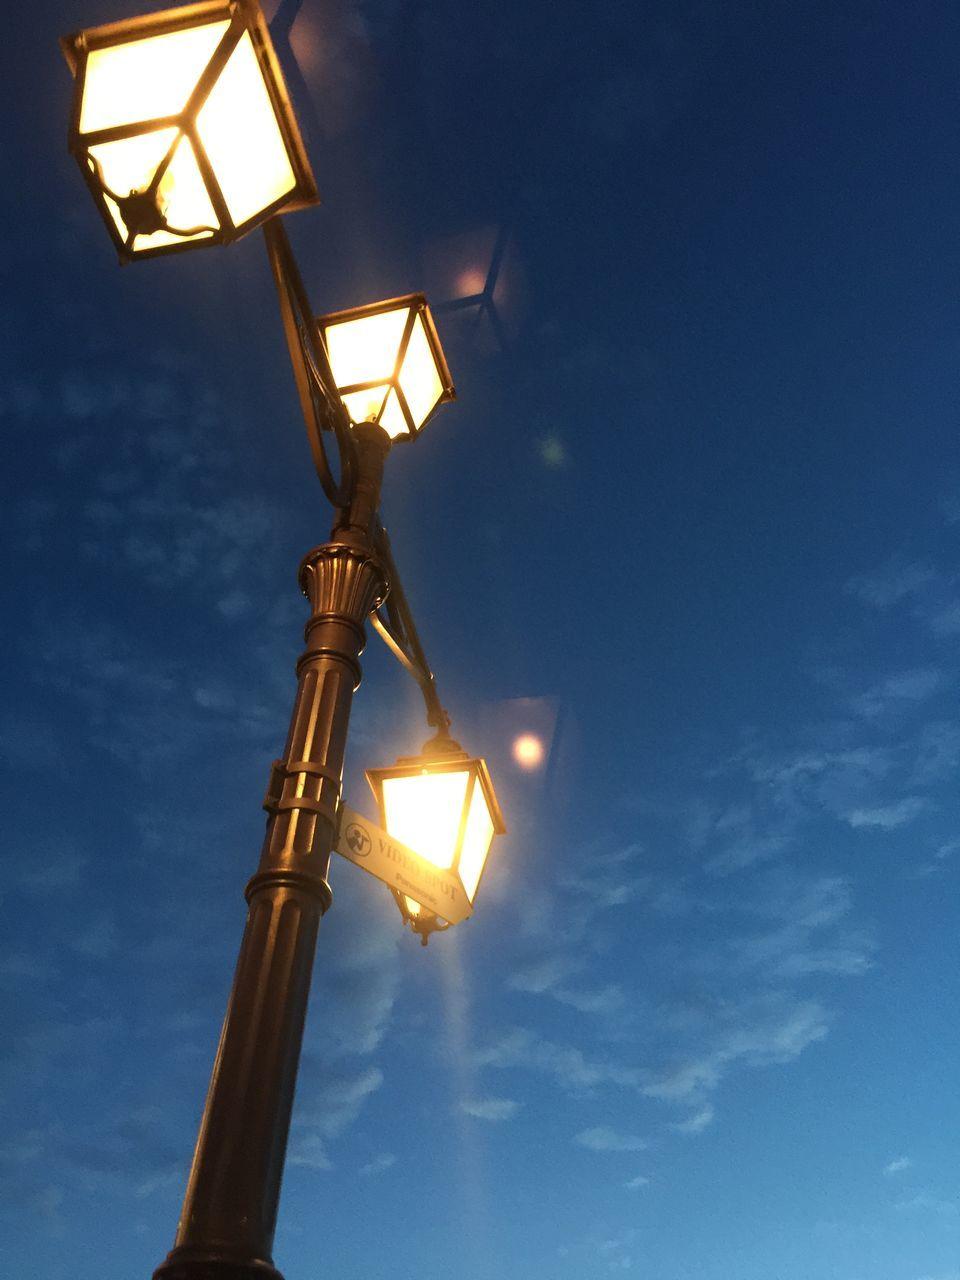 lighting equipment, illuminated, low angle view, street light, electric light, sky, street lamp, floodlight, no people, night, gas light, outdoors, blue, electricity